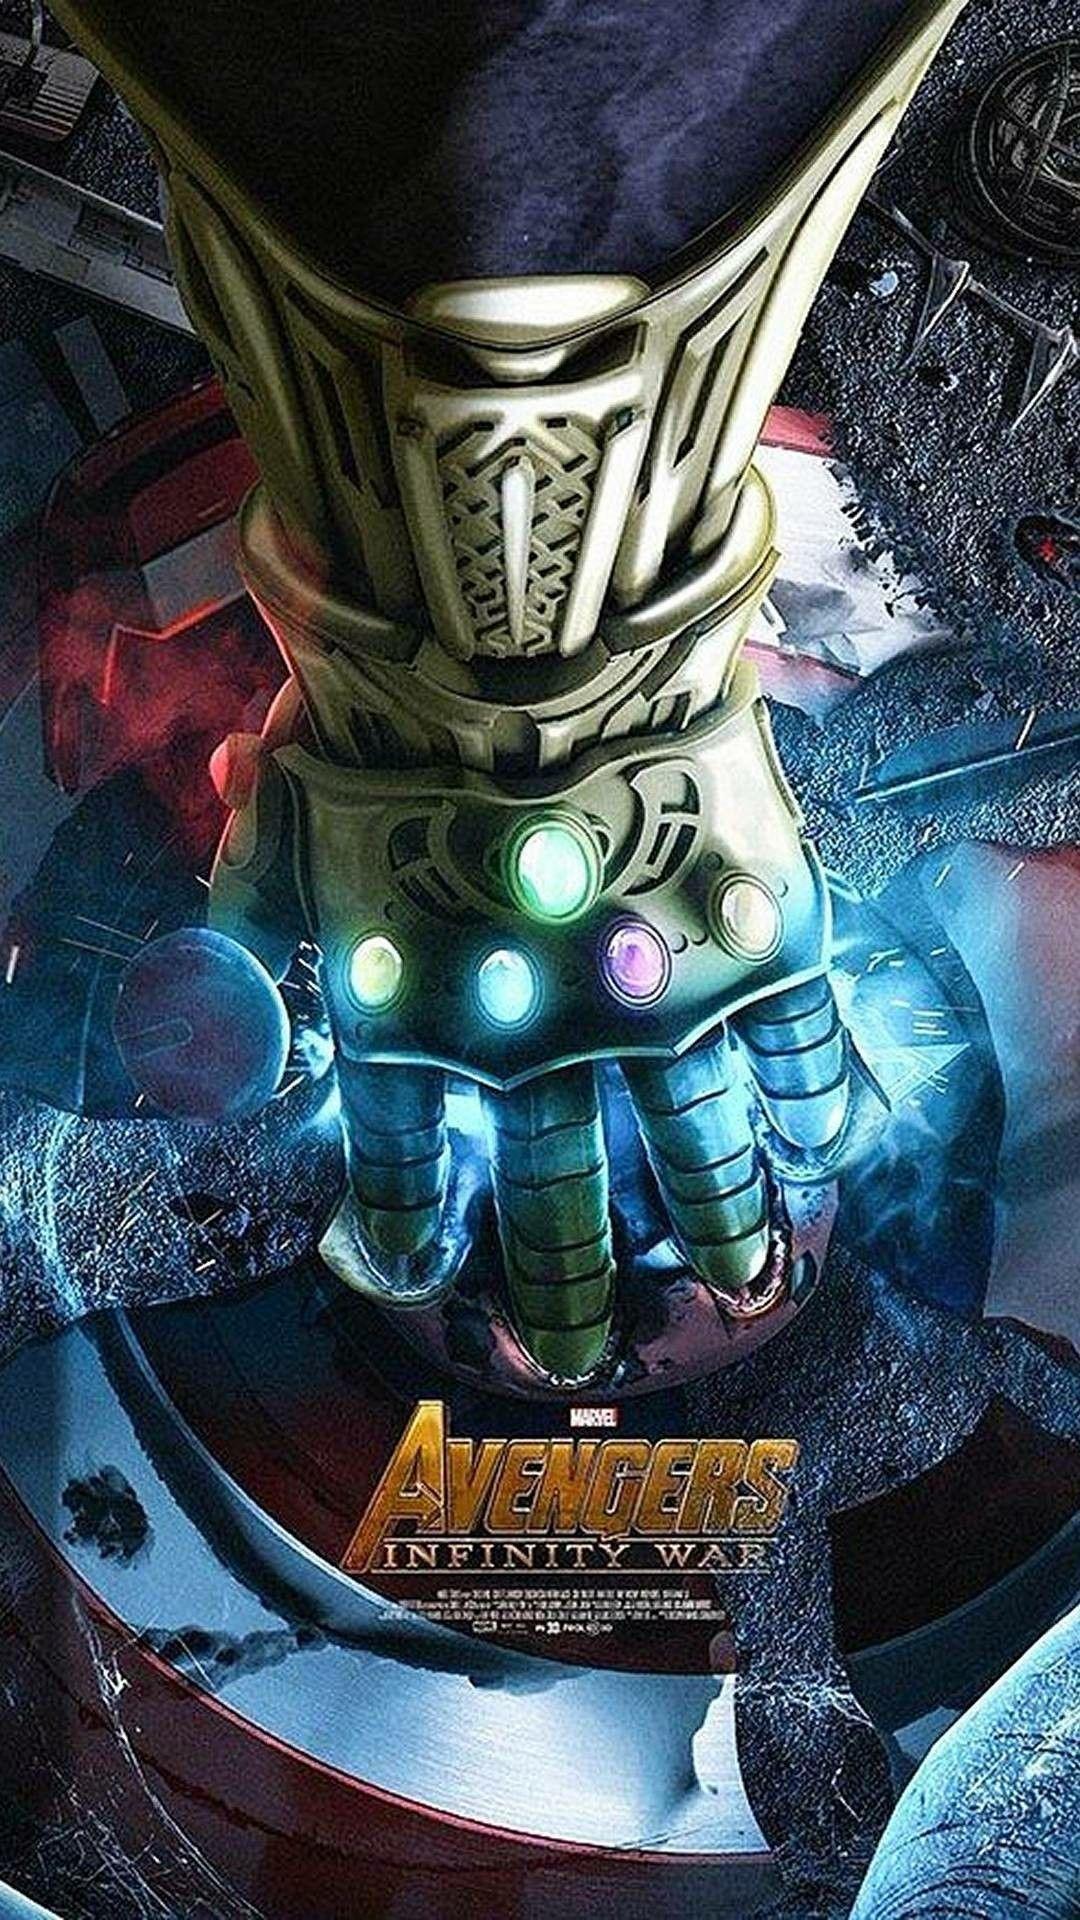 El Guante Del Infinito Marvelsuperherostar Warshunger Games Iron Man Circuit Superhros Marvel Comics Logostore New Avengers Superheroes Art Movies